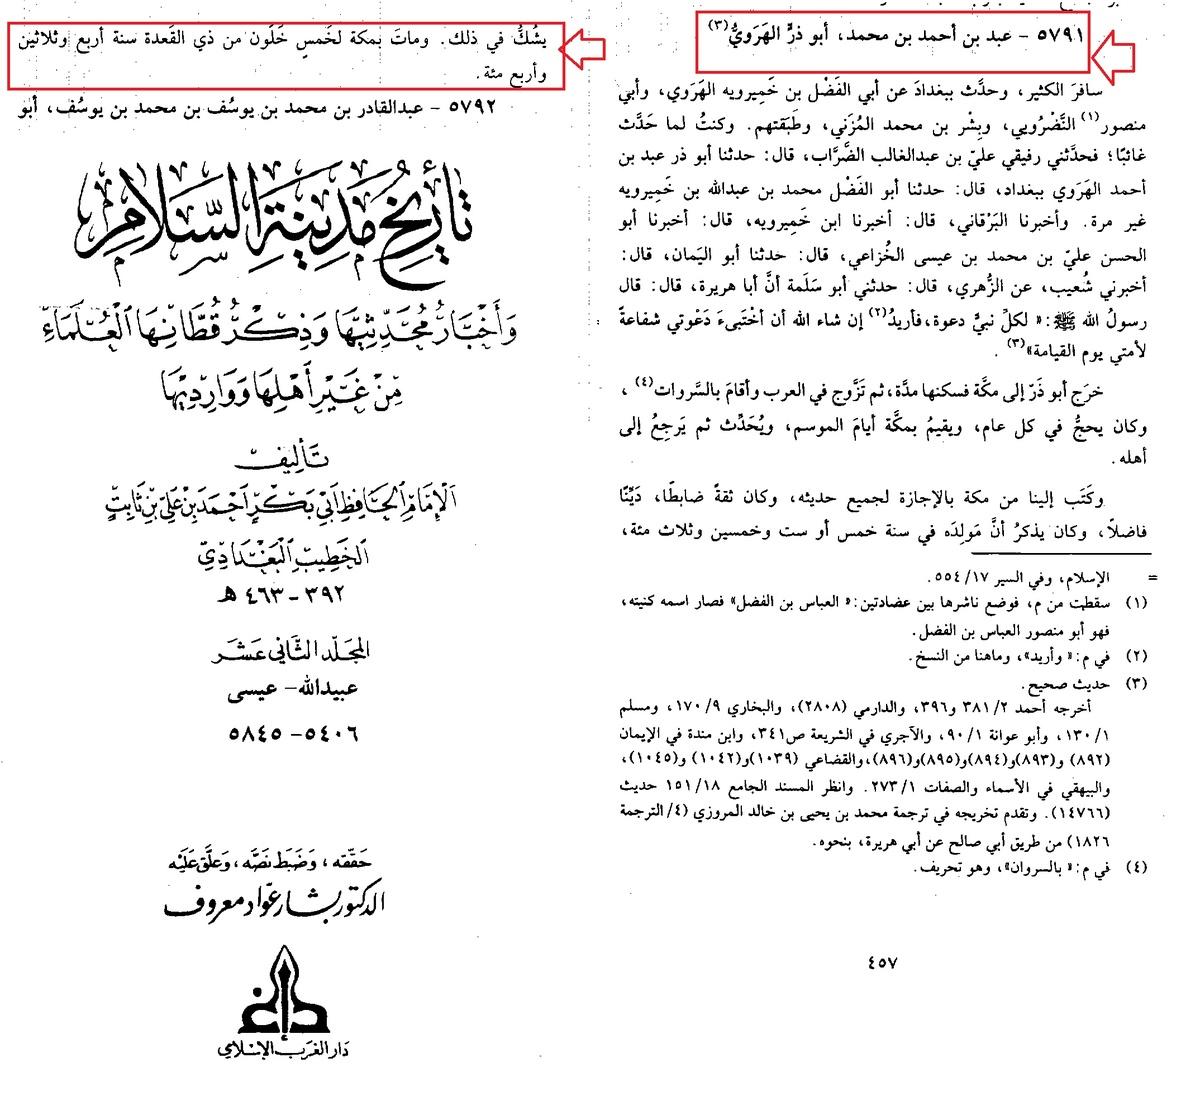 5991639bab897_tarikhbaghdadseabuzarkiwafat.thumb.jpg.42600536053b0aac2dadd79f41321118.jpg